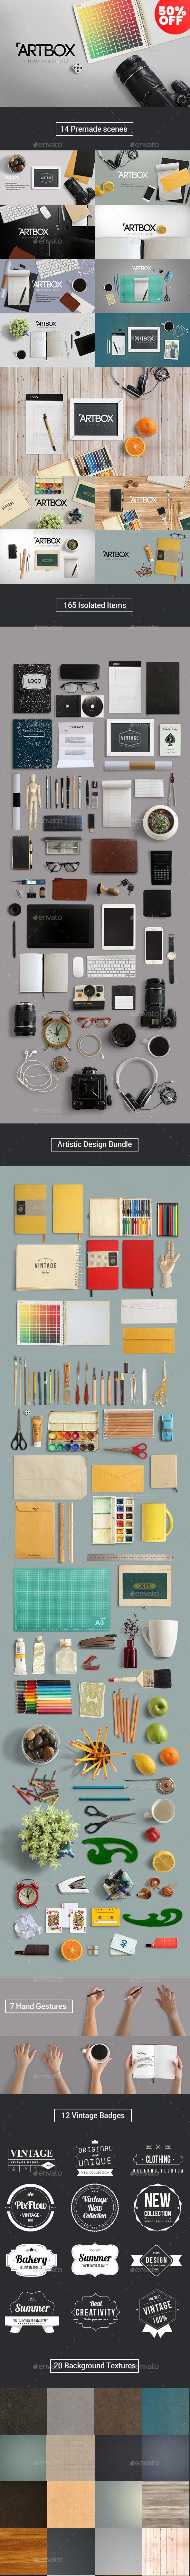 ArtBox - Artistic Mockup Kit - Hero Images Graphics